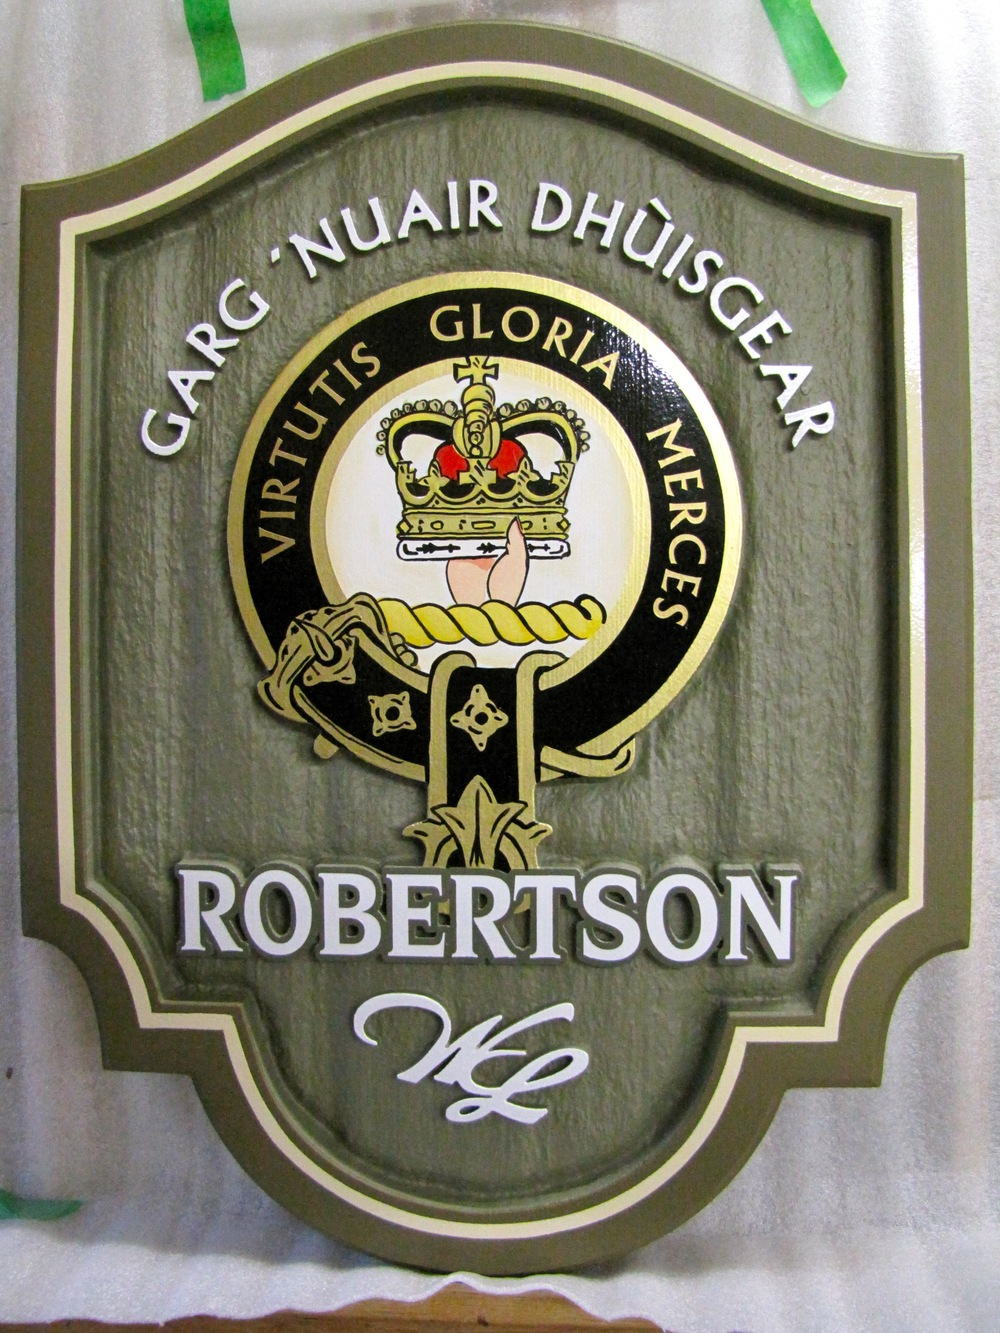 robertson.jpg